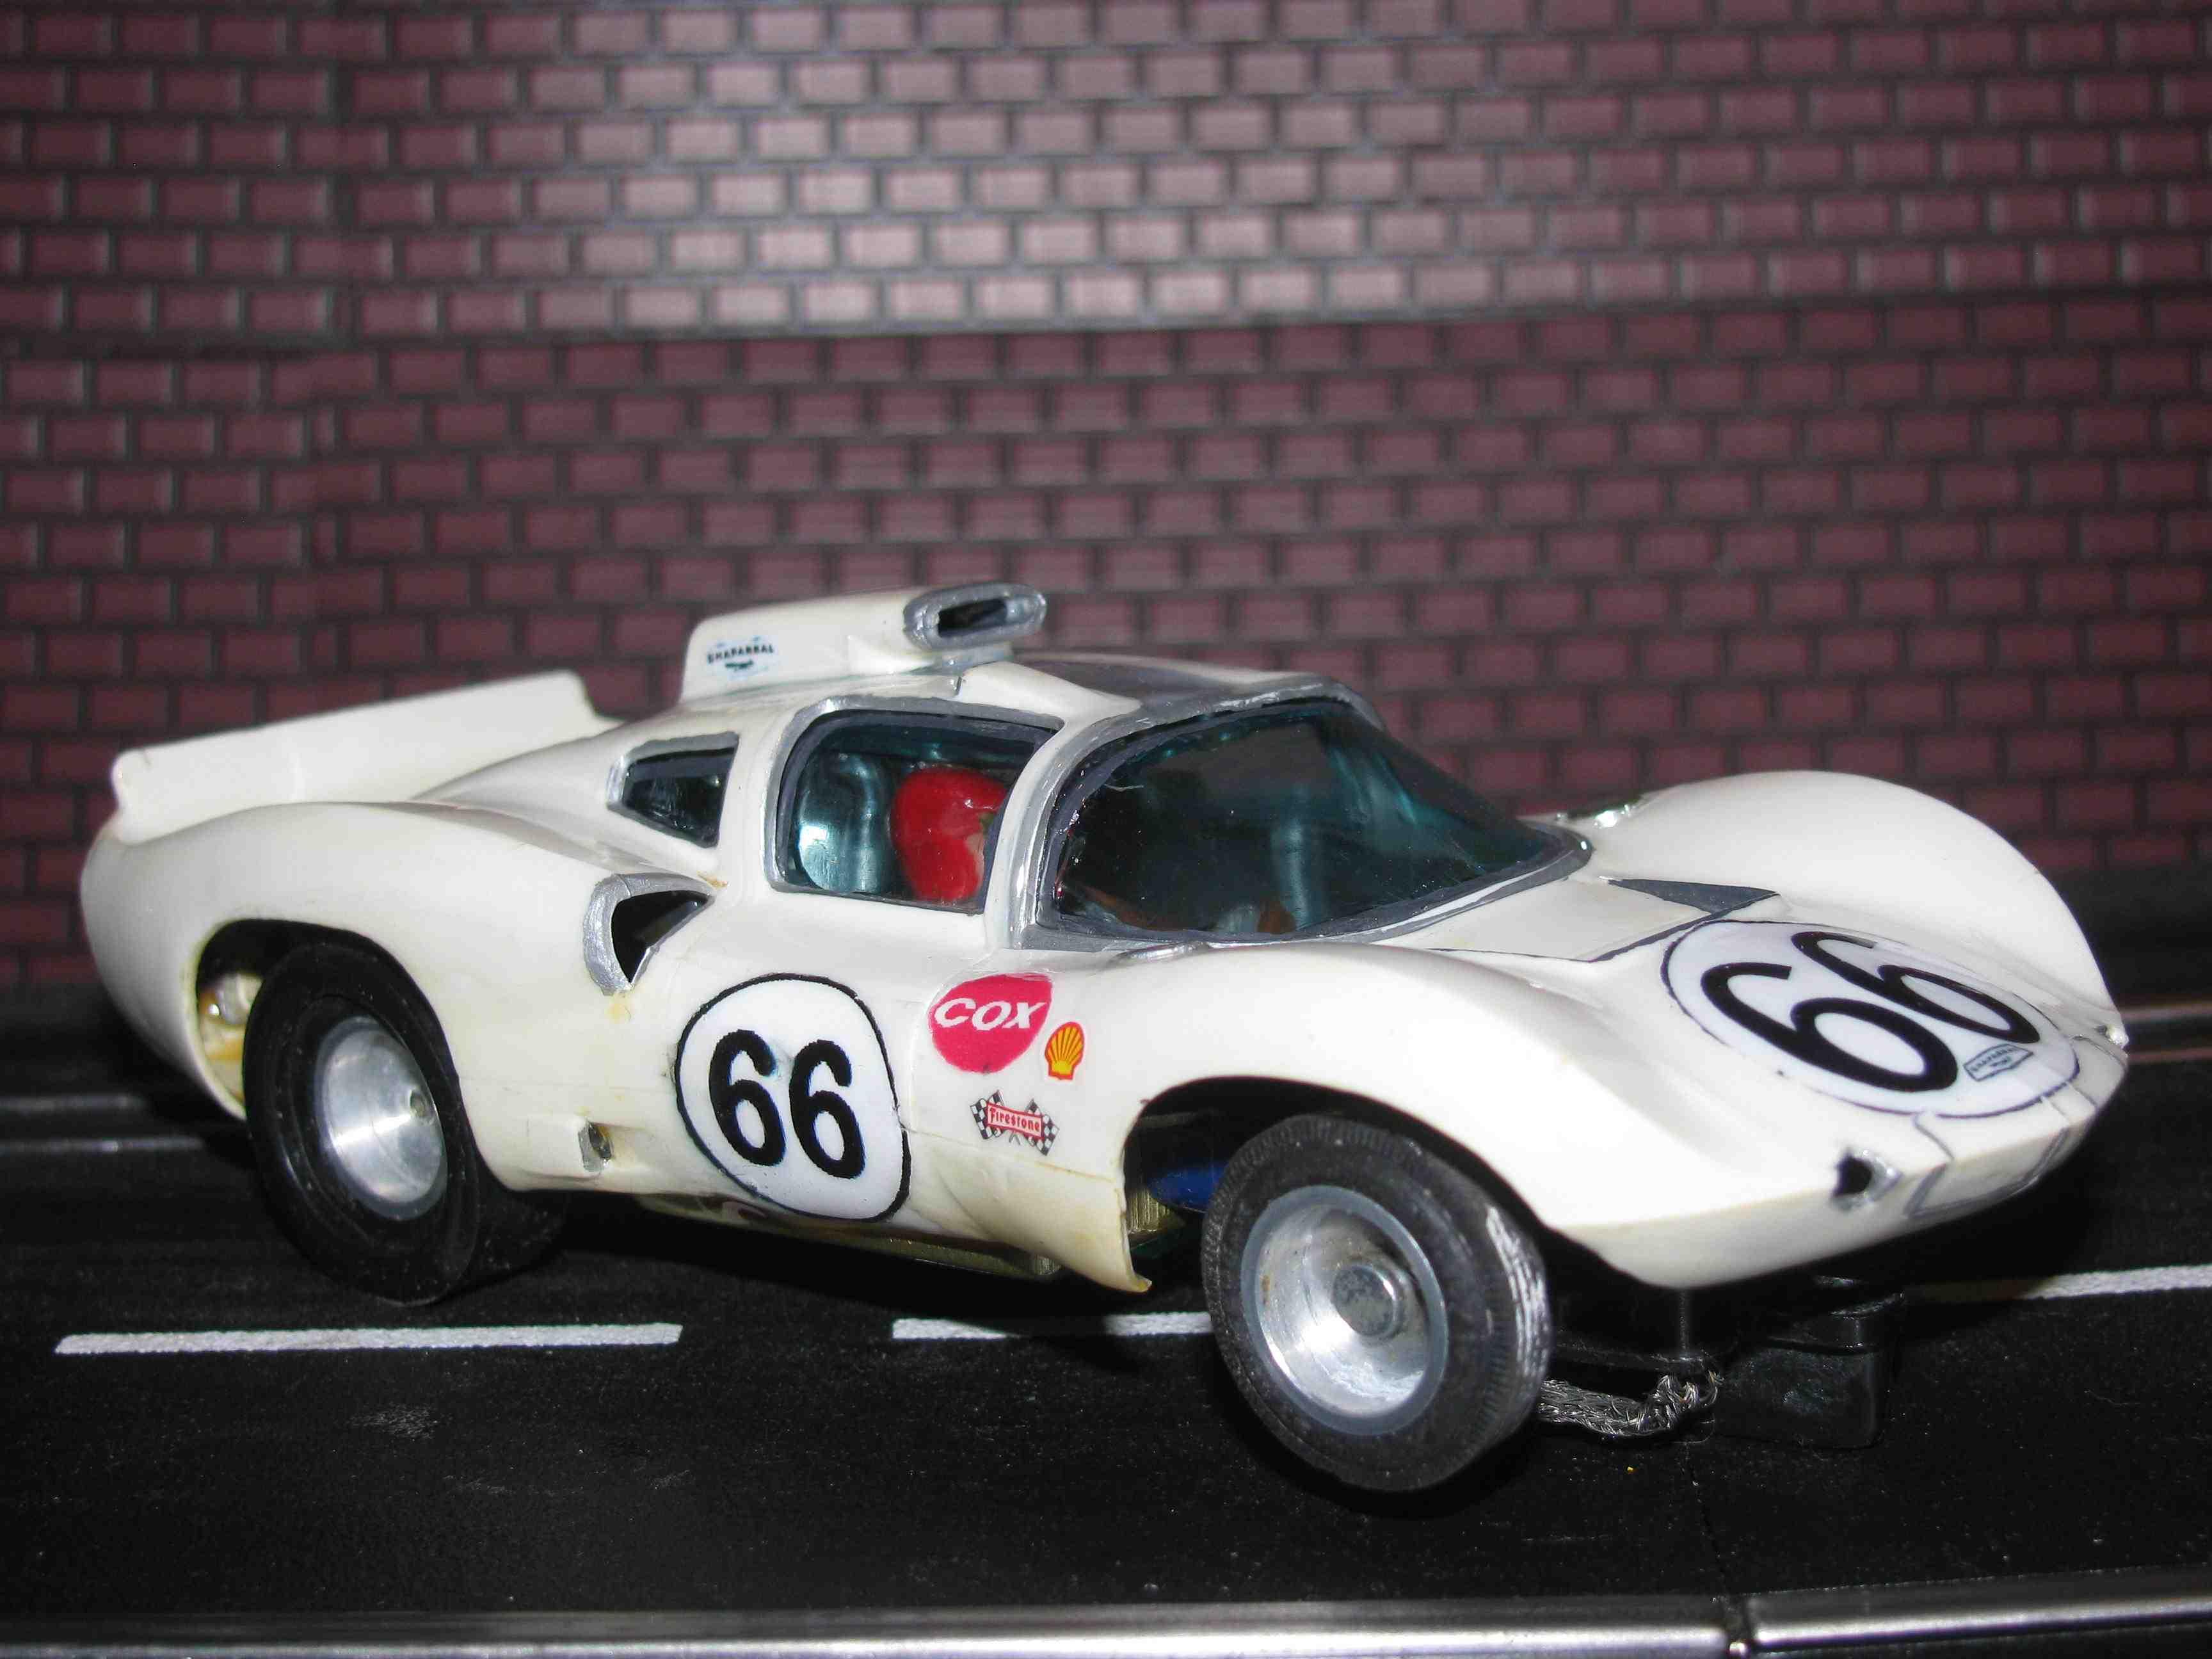 * SOLD * Strombecker CHAPARRAL 2D Vintage Slot Car White #66 – 1/32 Scale